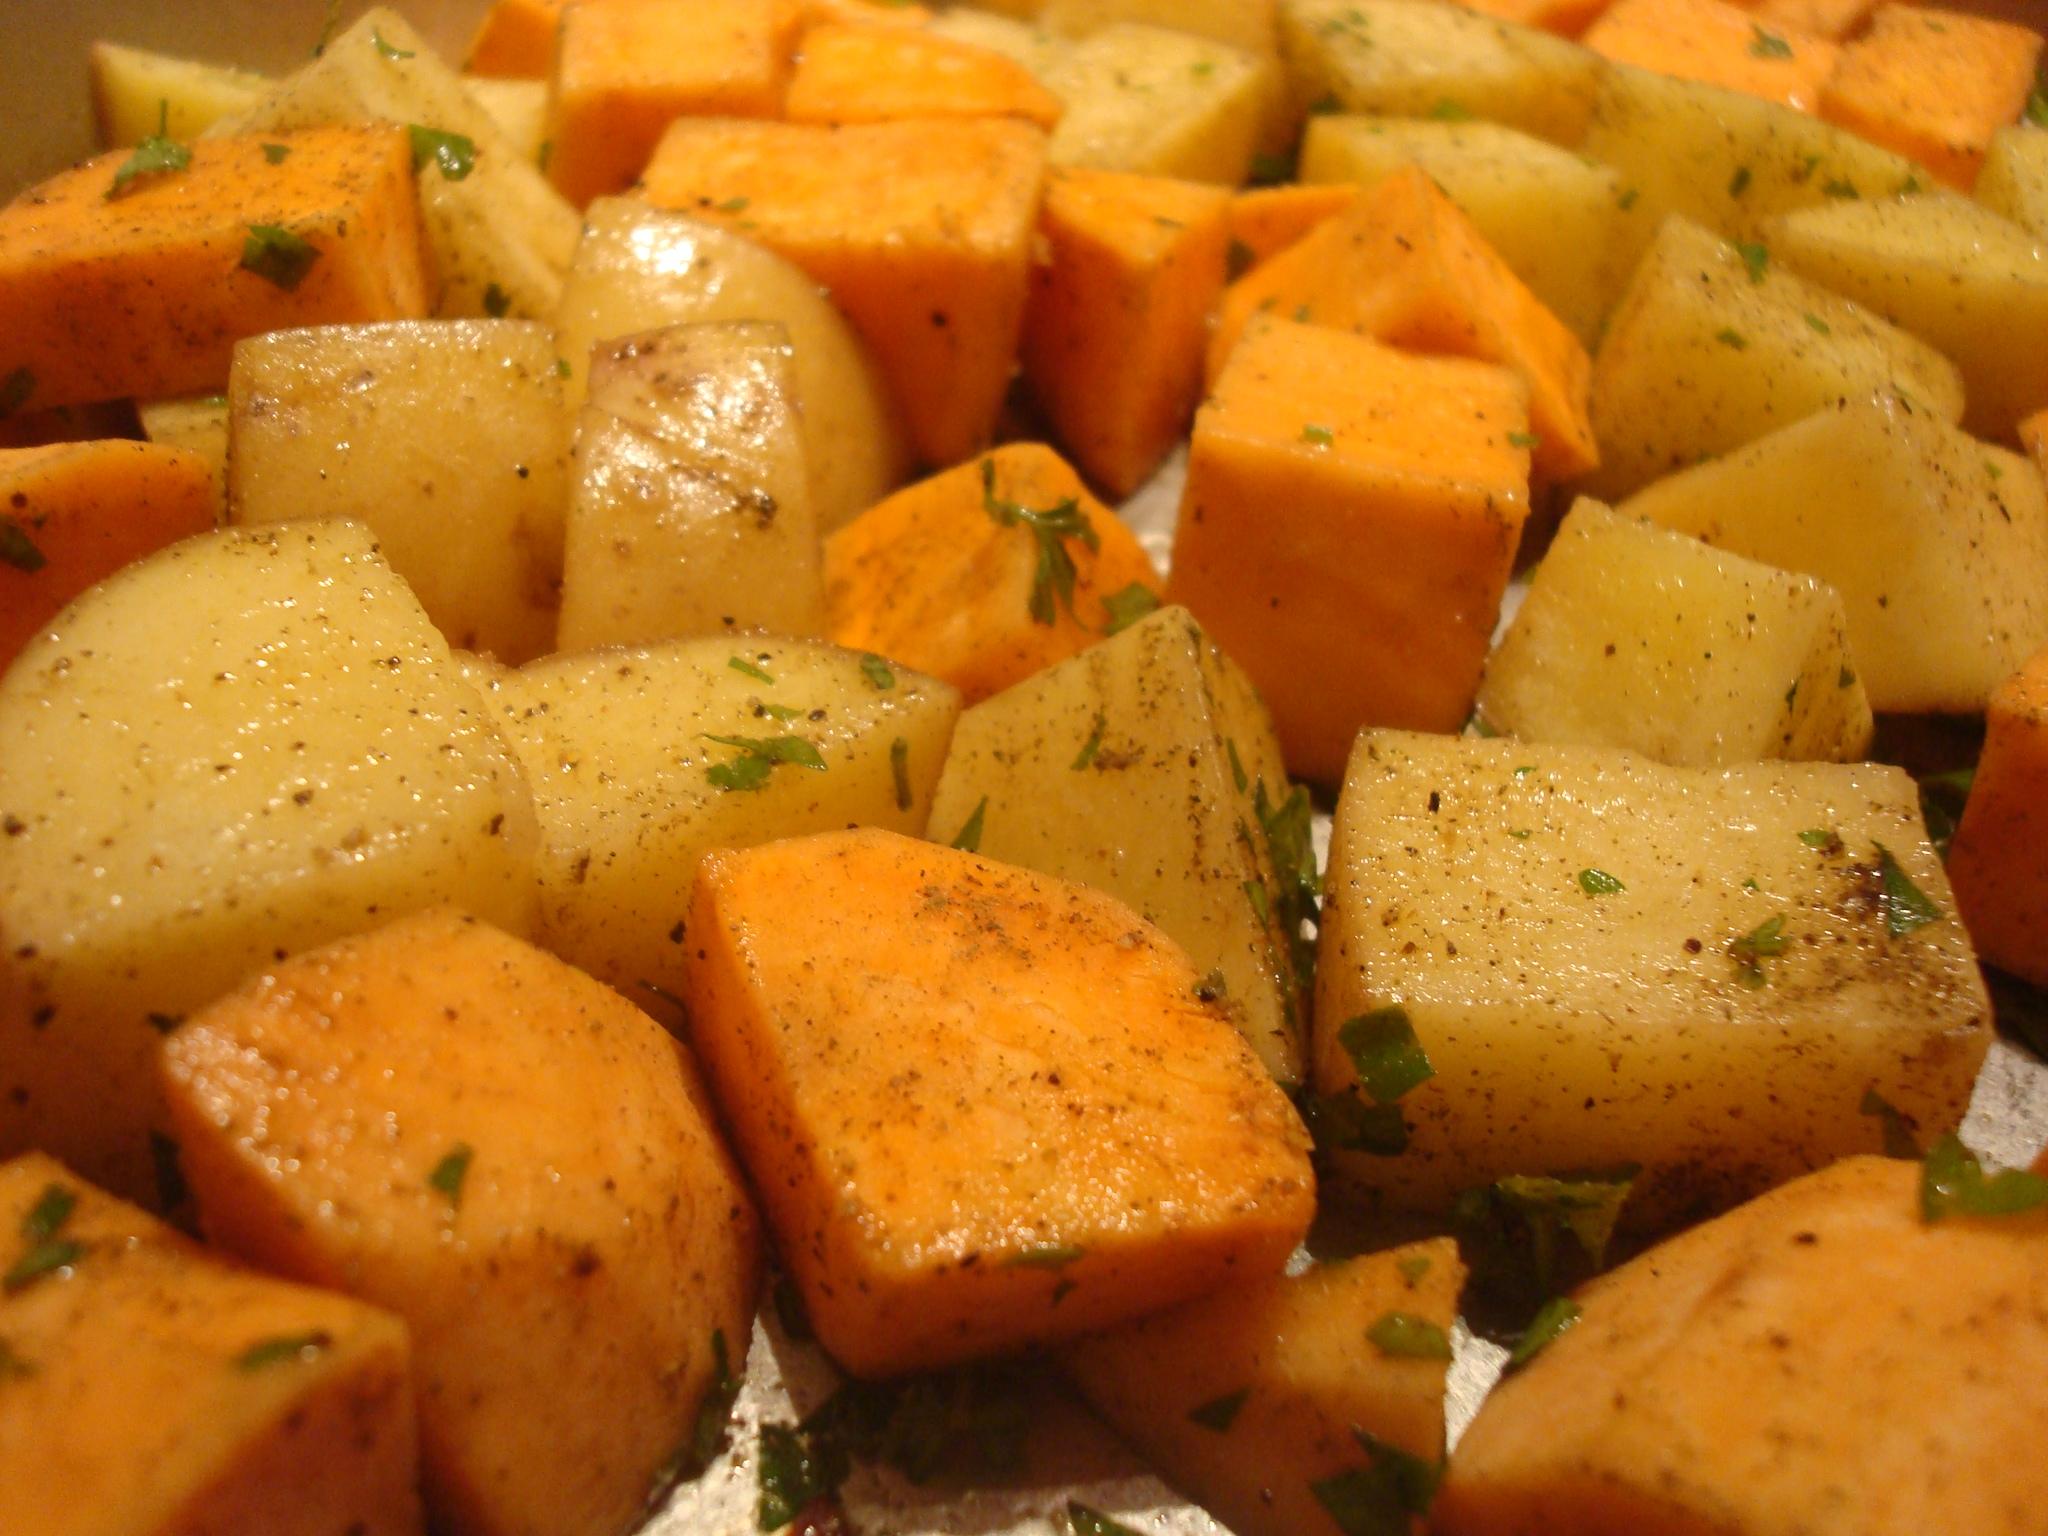 Thanksgiving Fresh Yams With Marshmallows Recipe